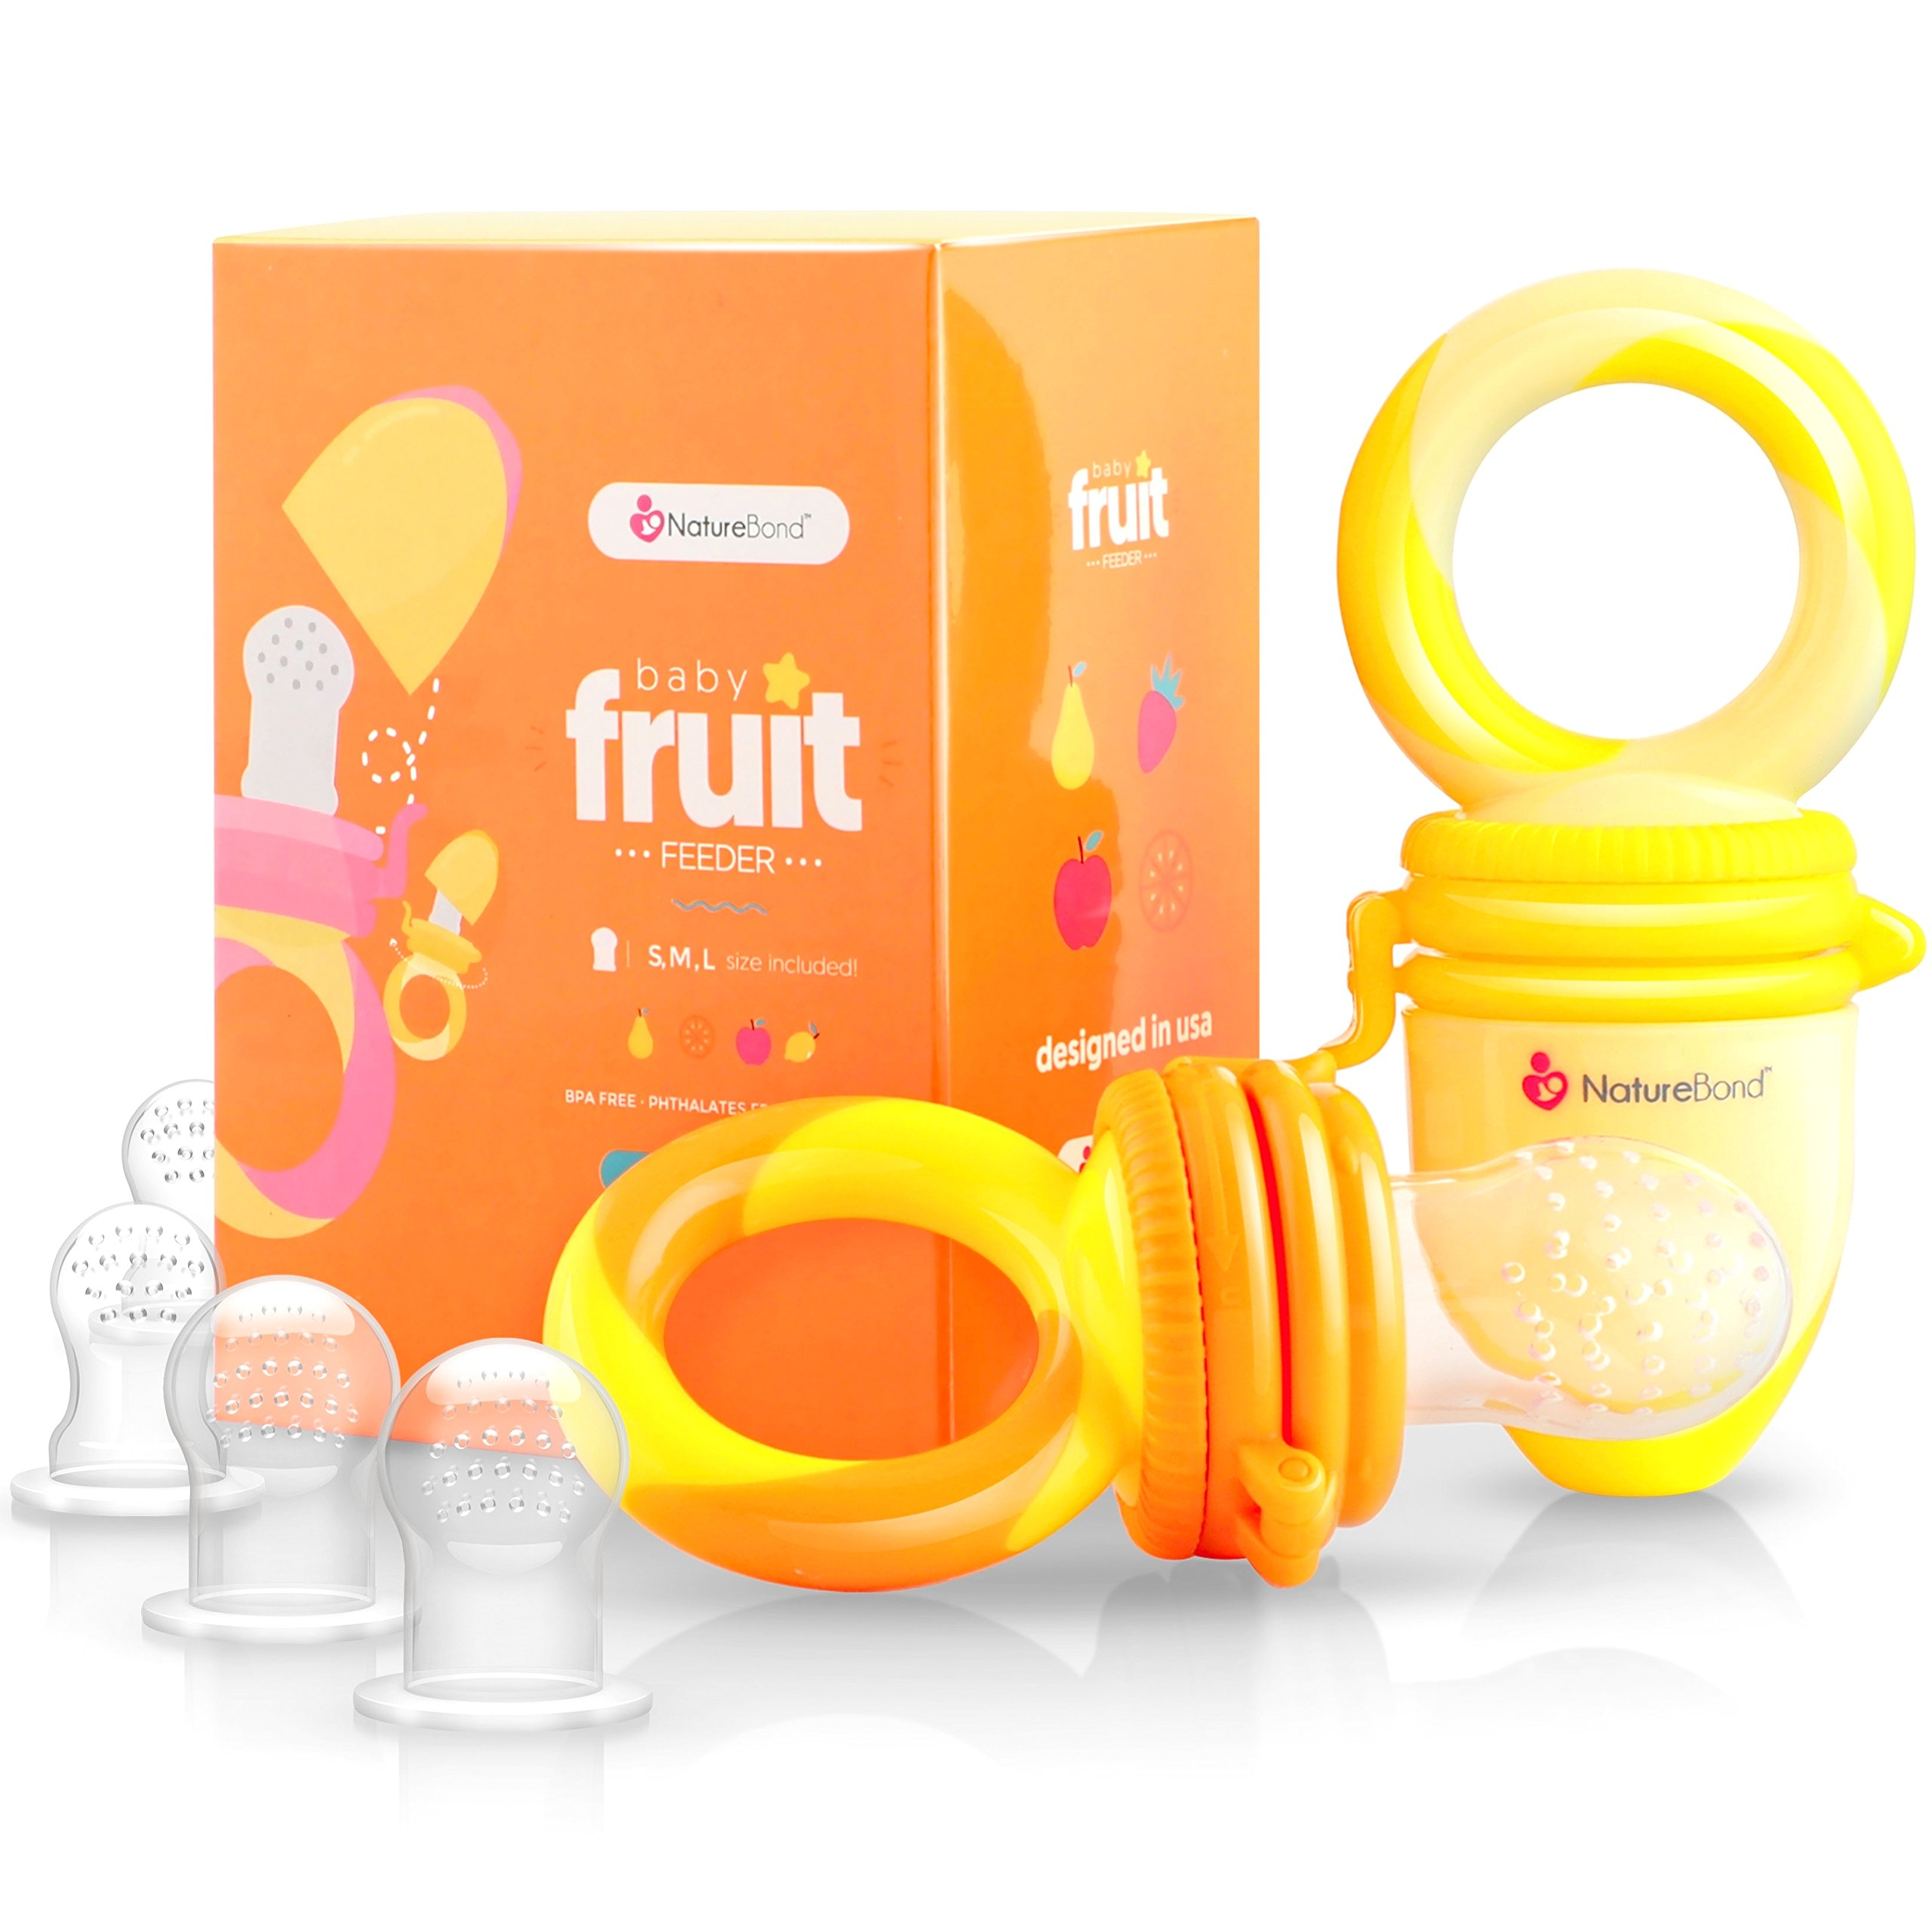 Alimentador para bebe/chupete para frutas de NatureBond (2 piezas) product image